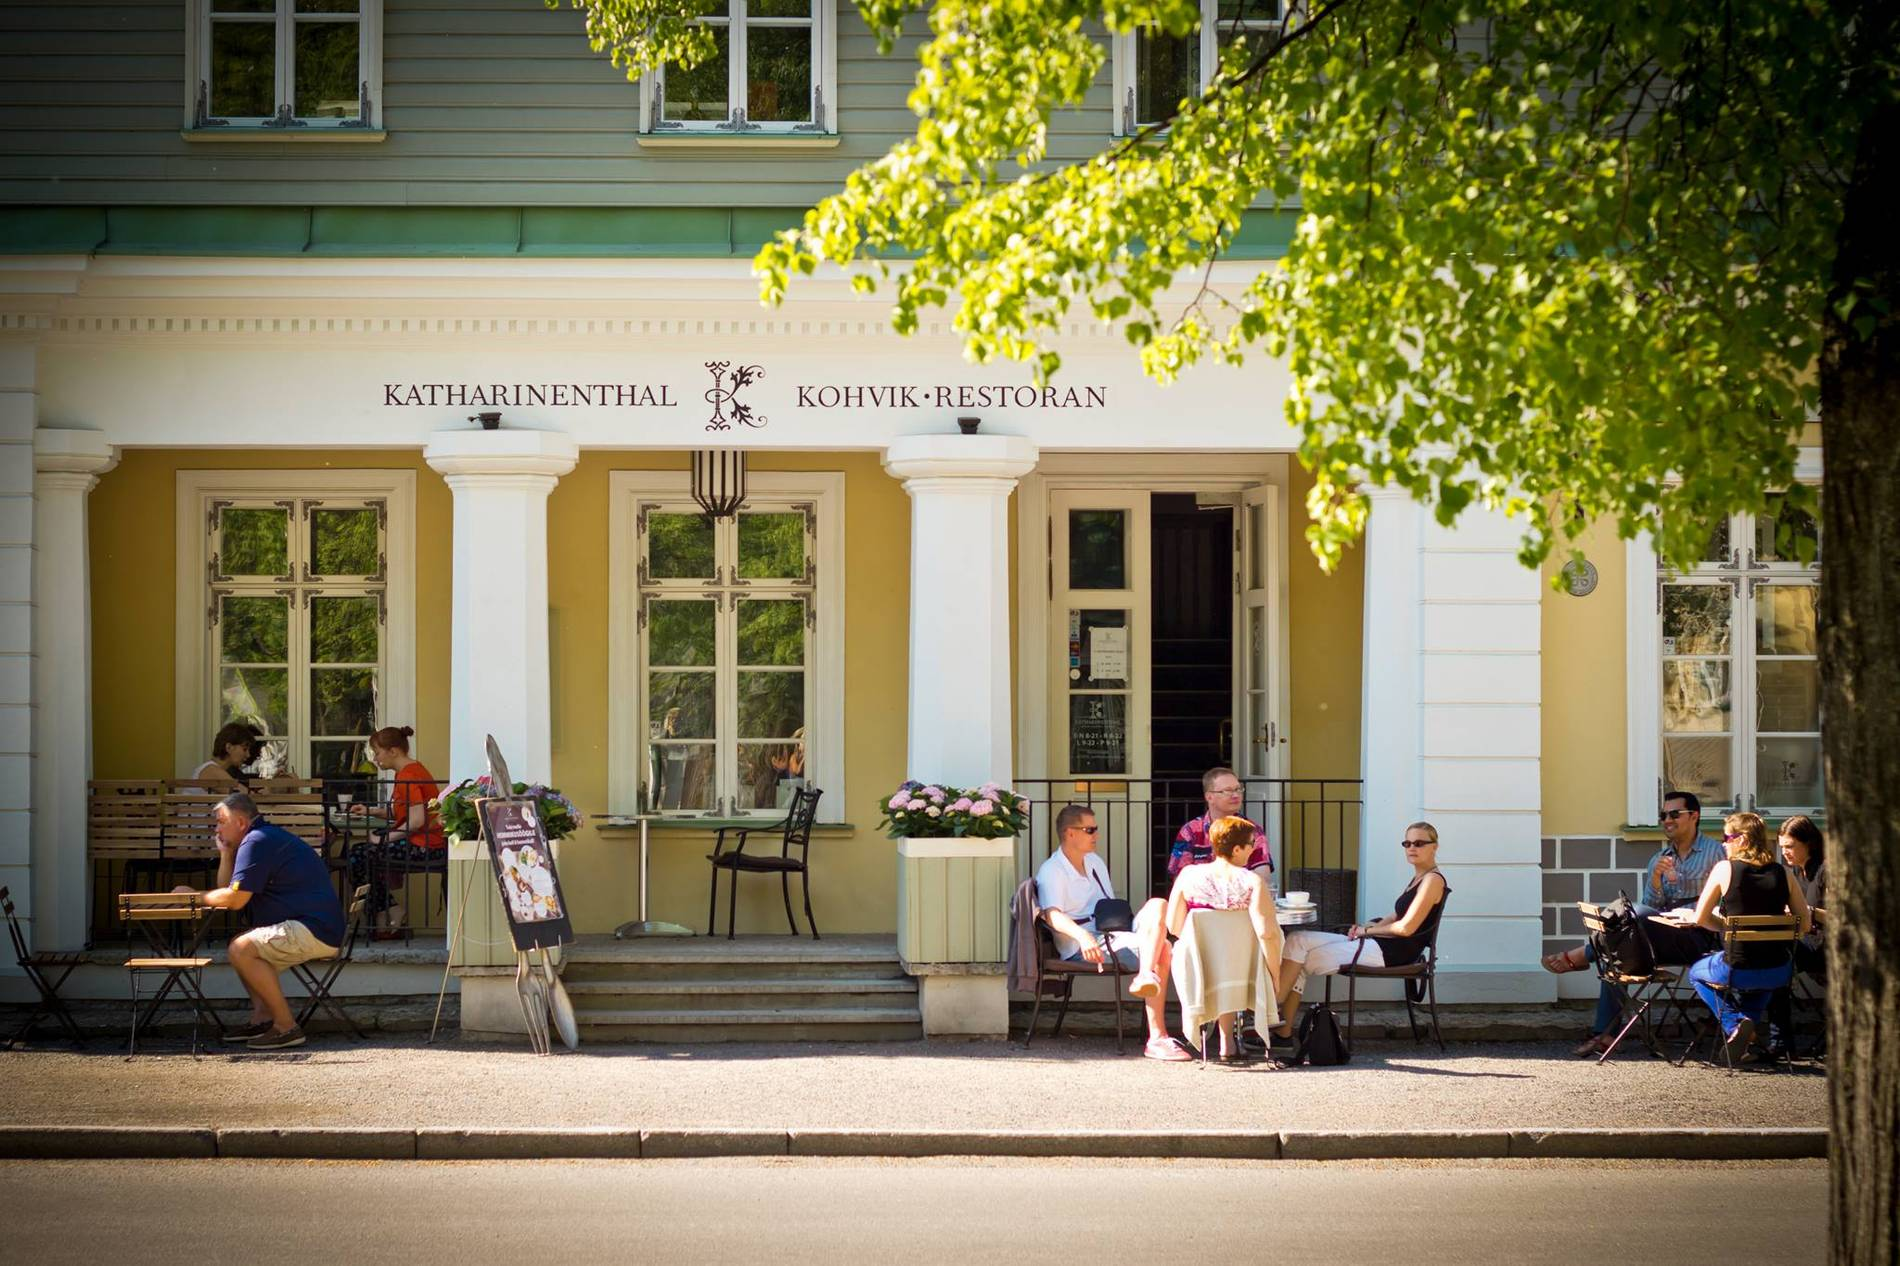 Katharinenthal